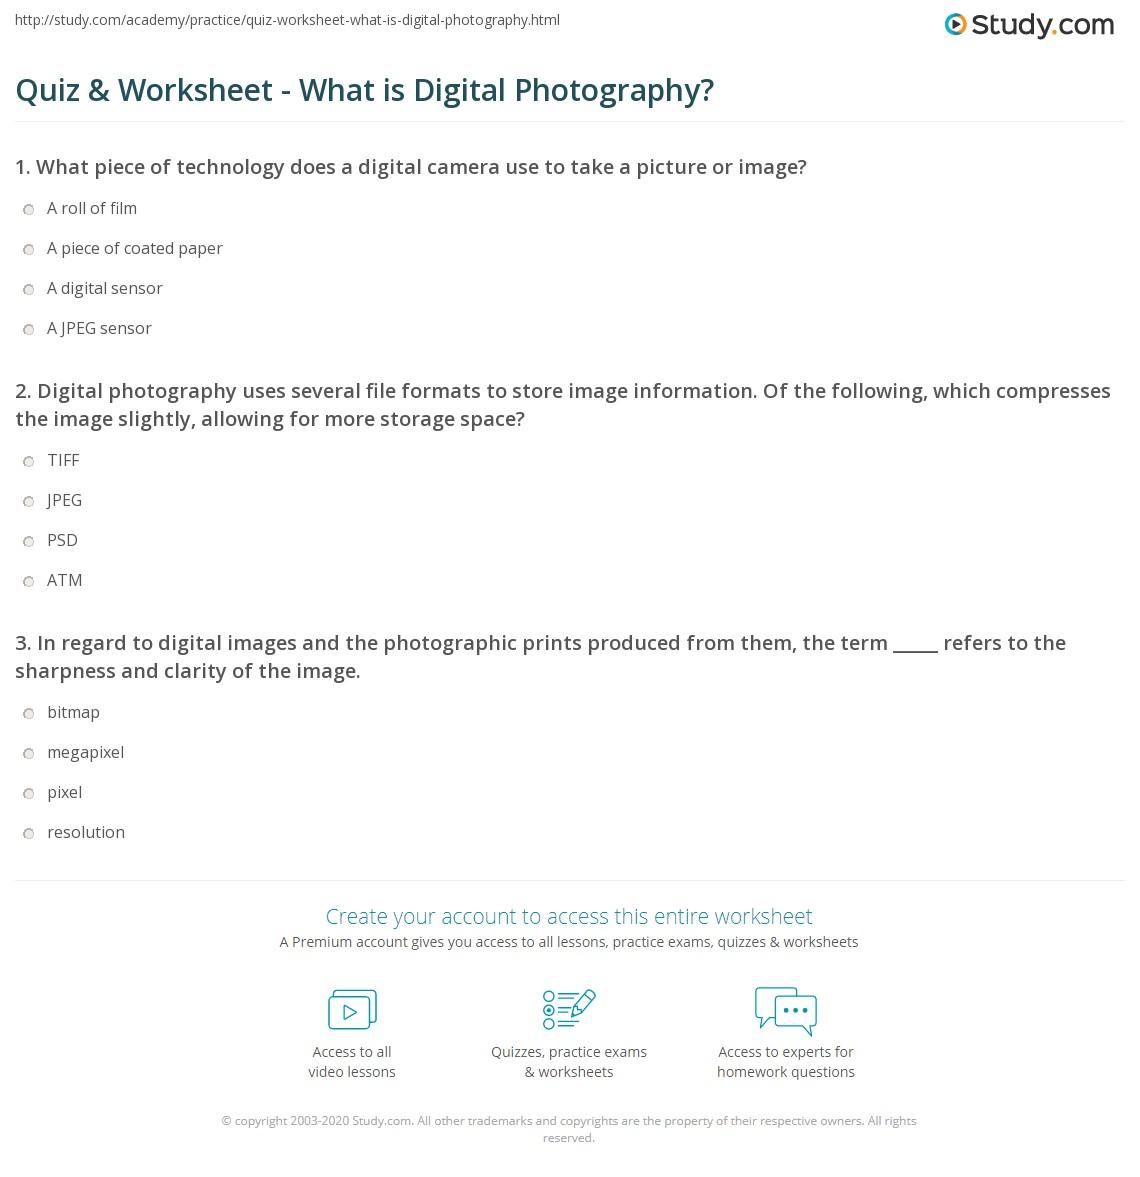 Digital Image Terminology Worksheet Answers